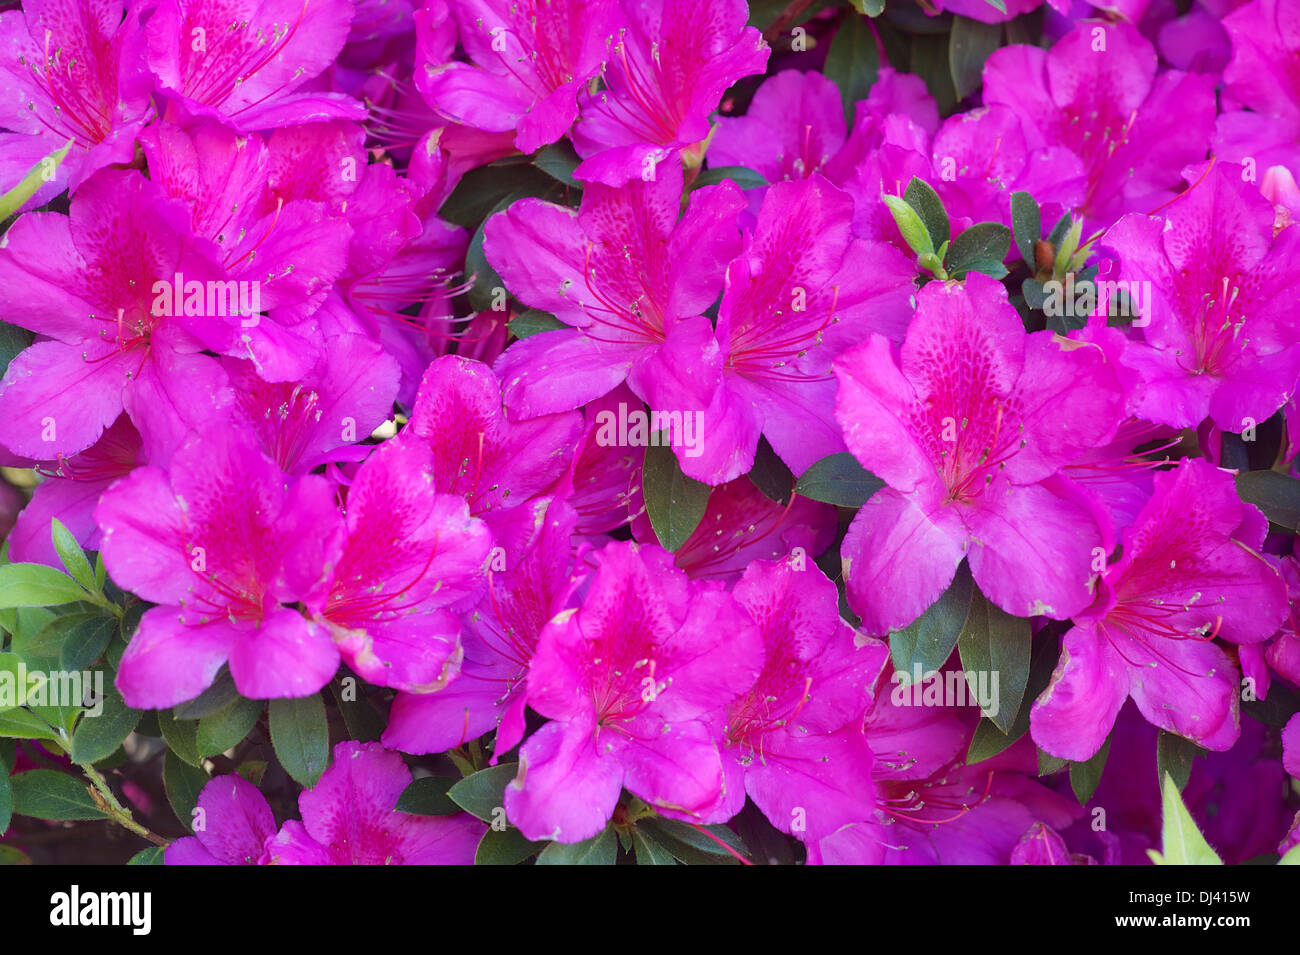 Blooming azaleas - Stock Image